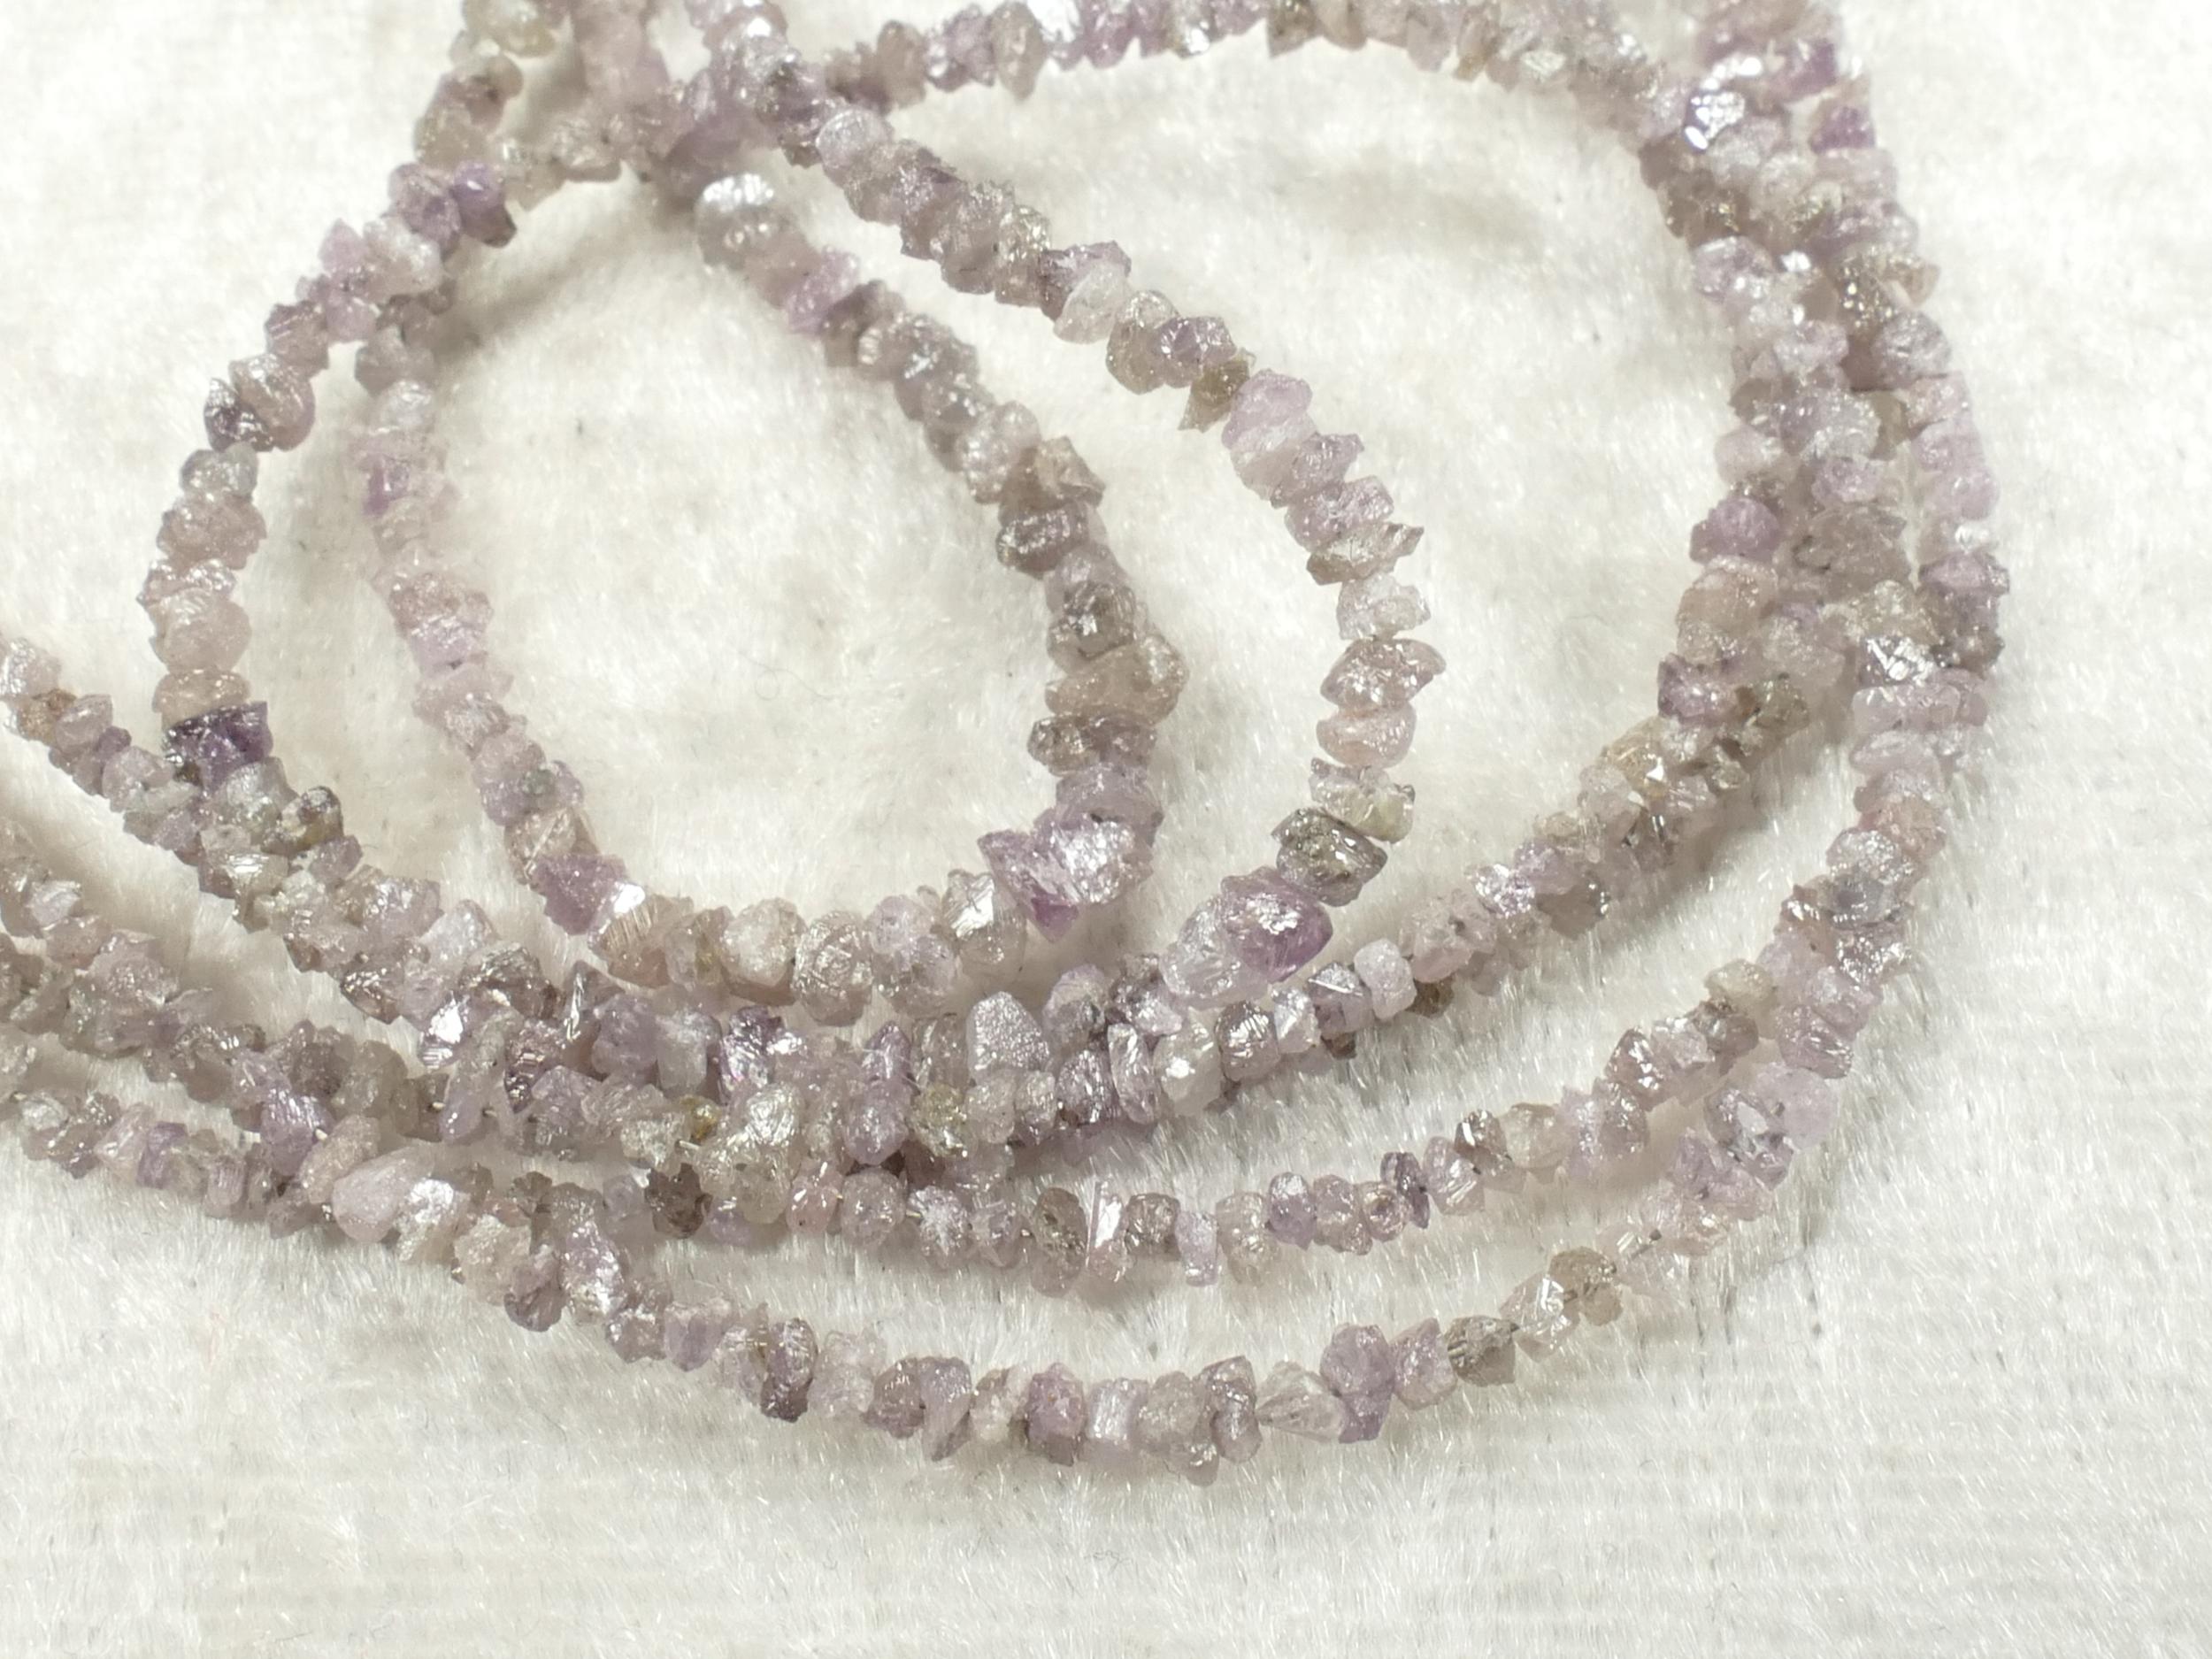 1.7/2.5mm Petites perles de Diamant rose violet léger naturel brut percé x1carat (#AC364)